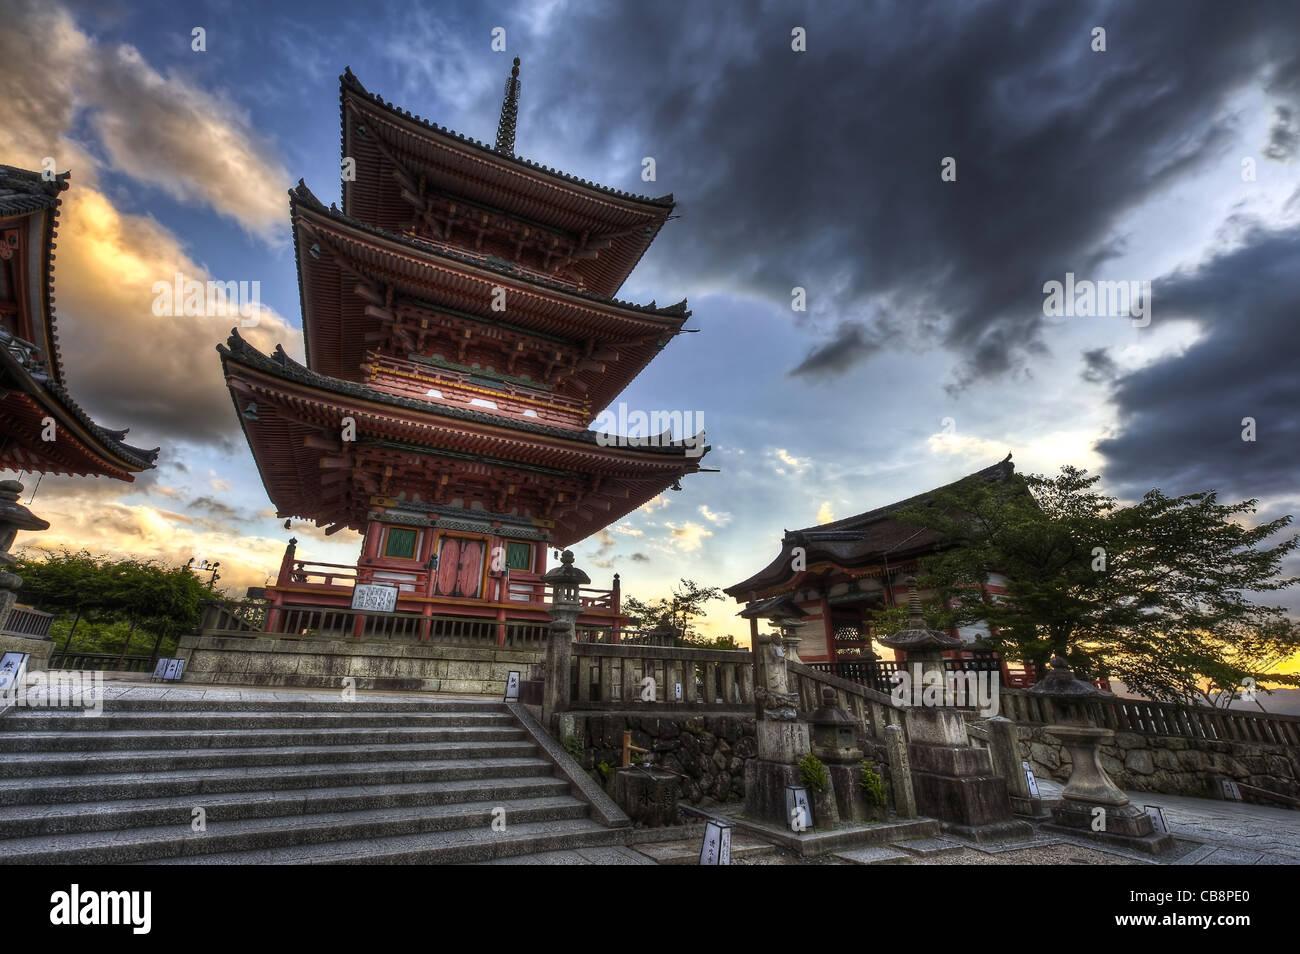 Three-story pagoda at famous Buddhism Kiyomizu-dera temple after the sunset. Kyoto, Japan. Built in Heian era. HDR - Stock Image